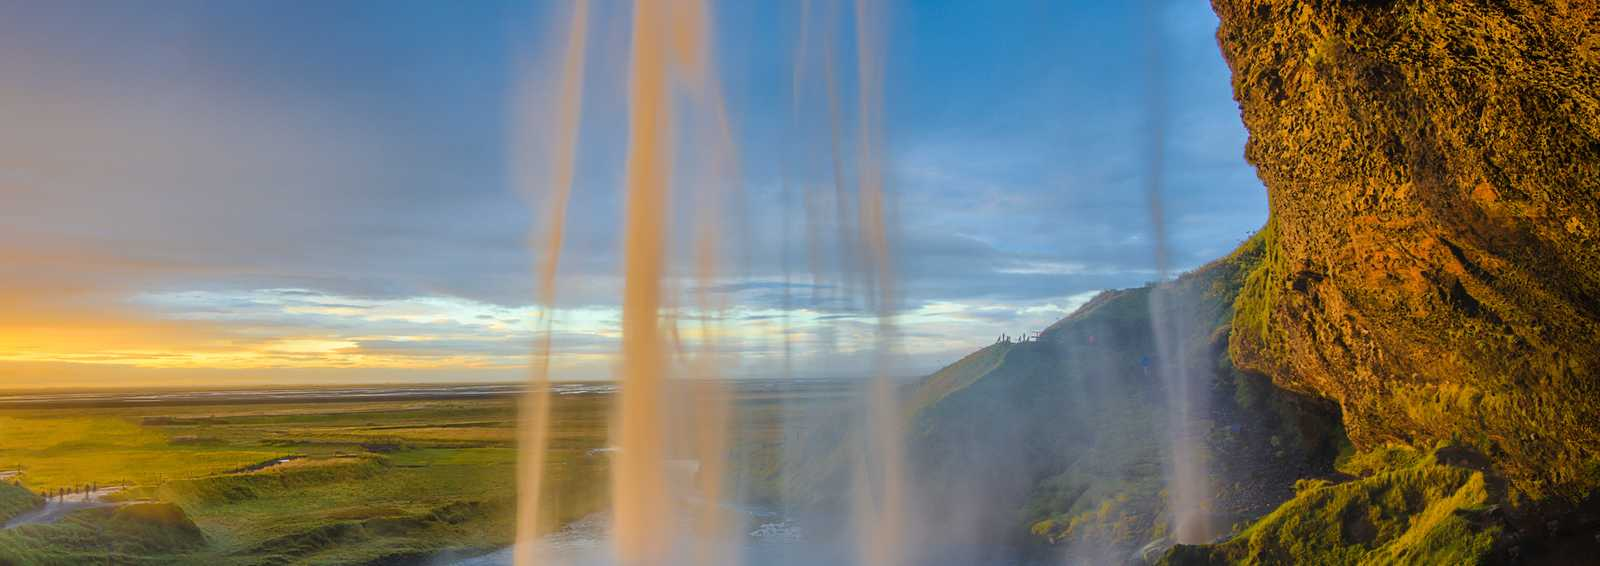 Iceland Summer Waterfall